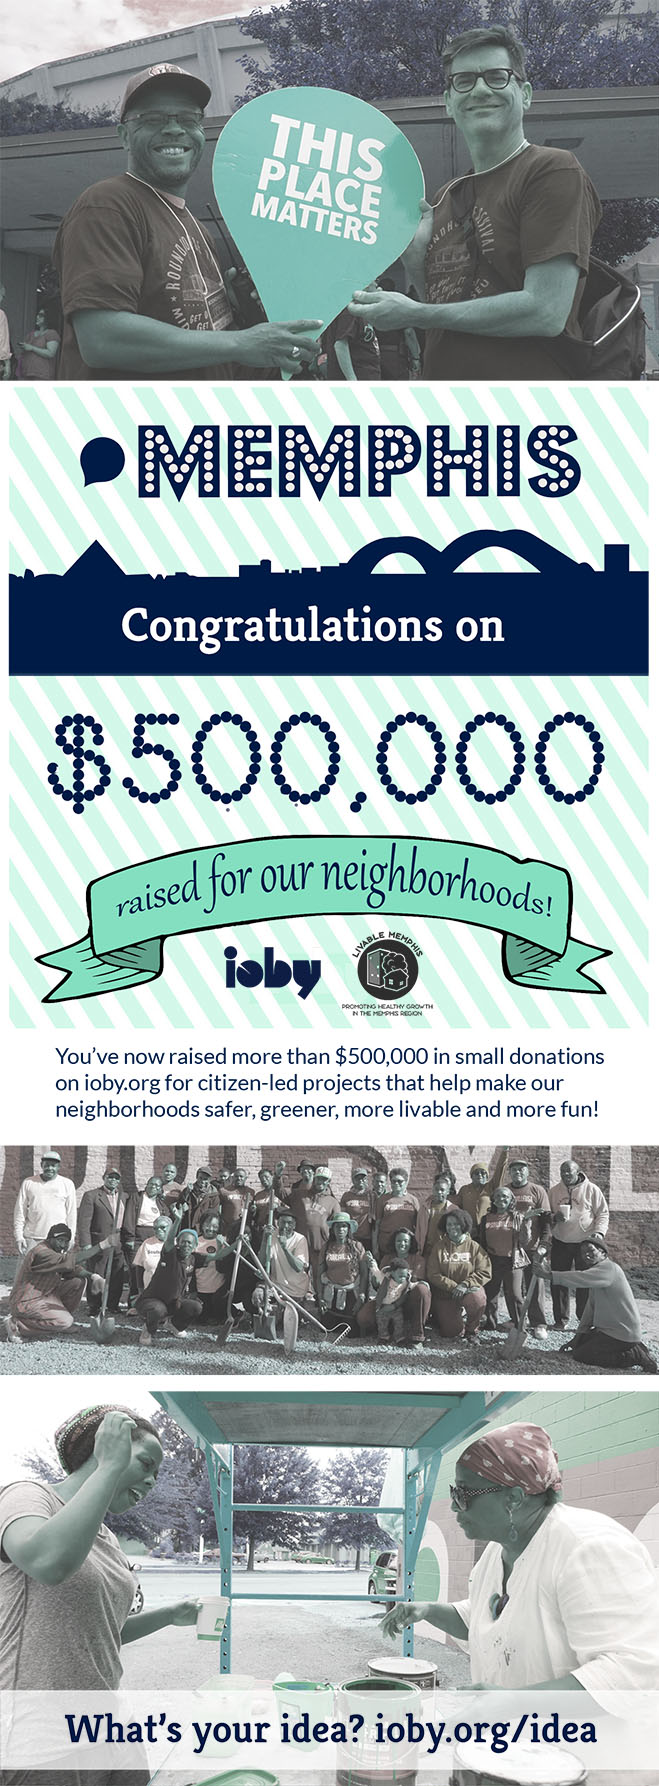 ioby Memphis 500K ad_blog2